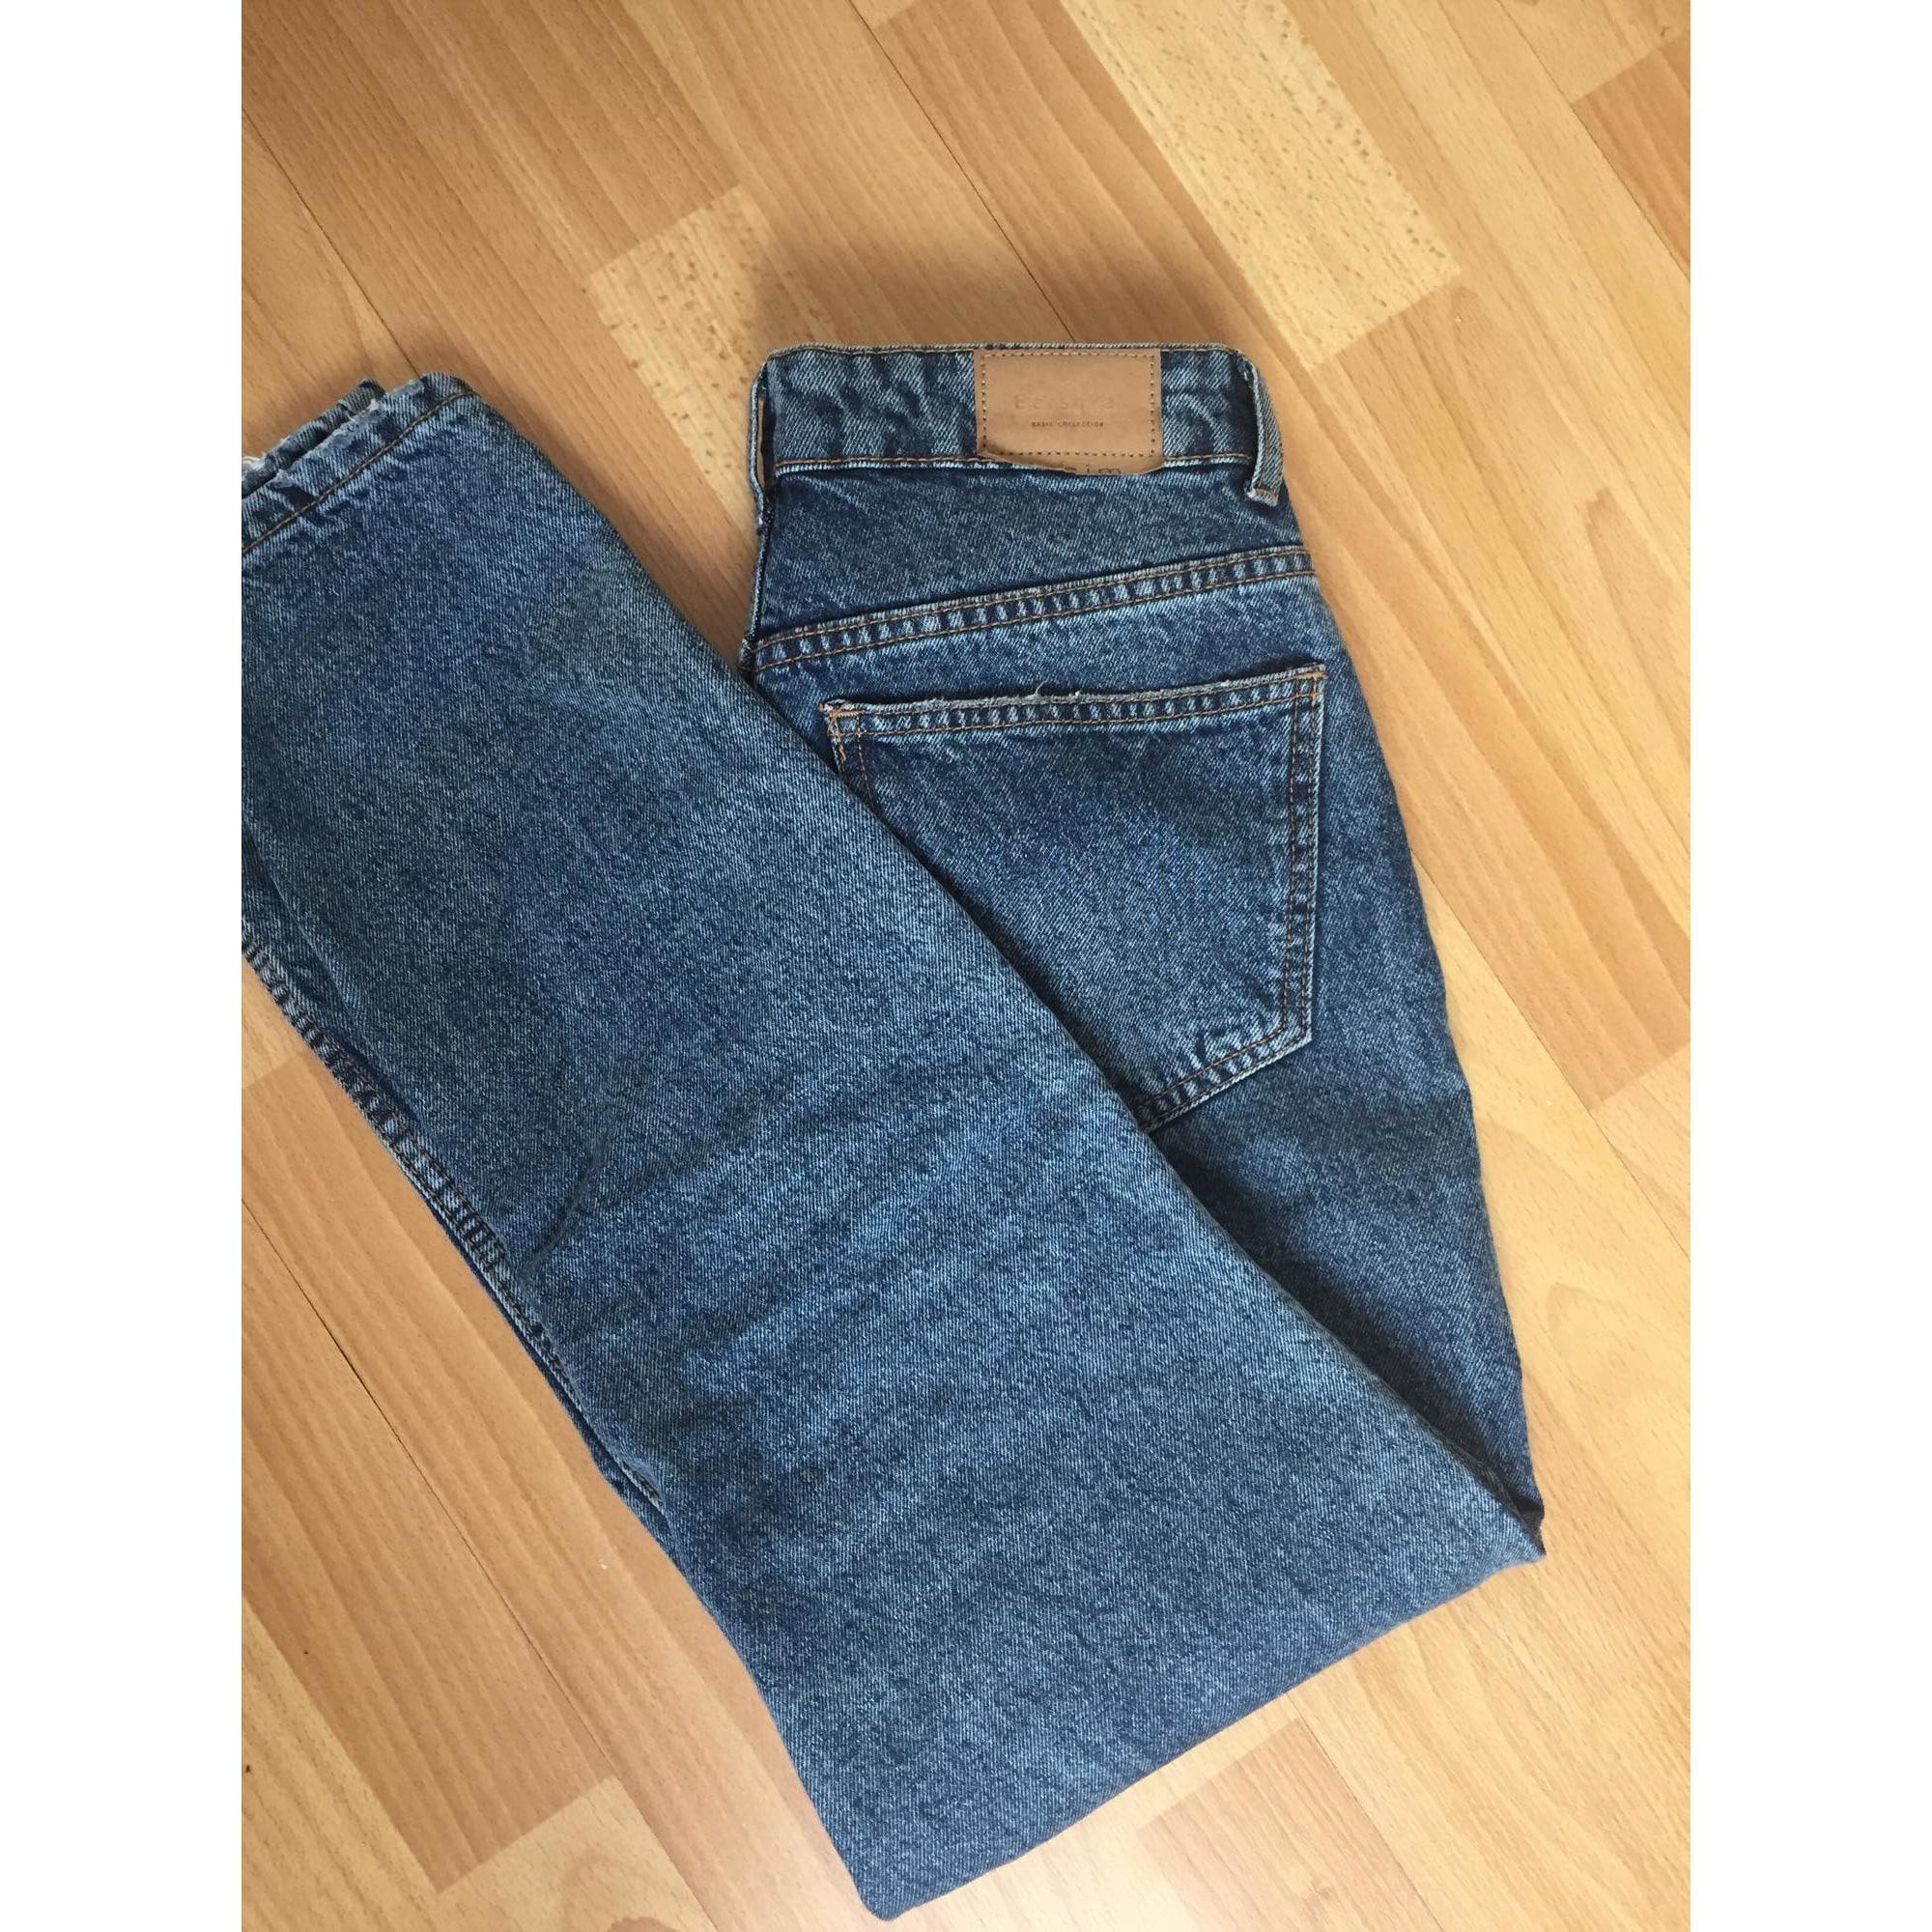 543a14ccff Jeans large, boyfriend BERSHKA W25 (T 34) jean foncé - 7329411